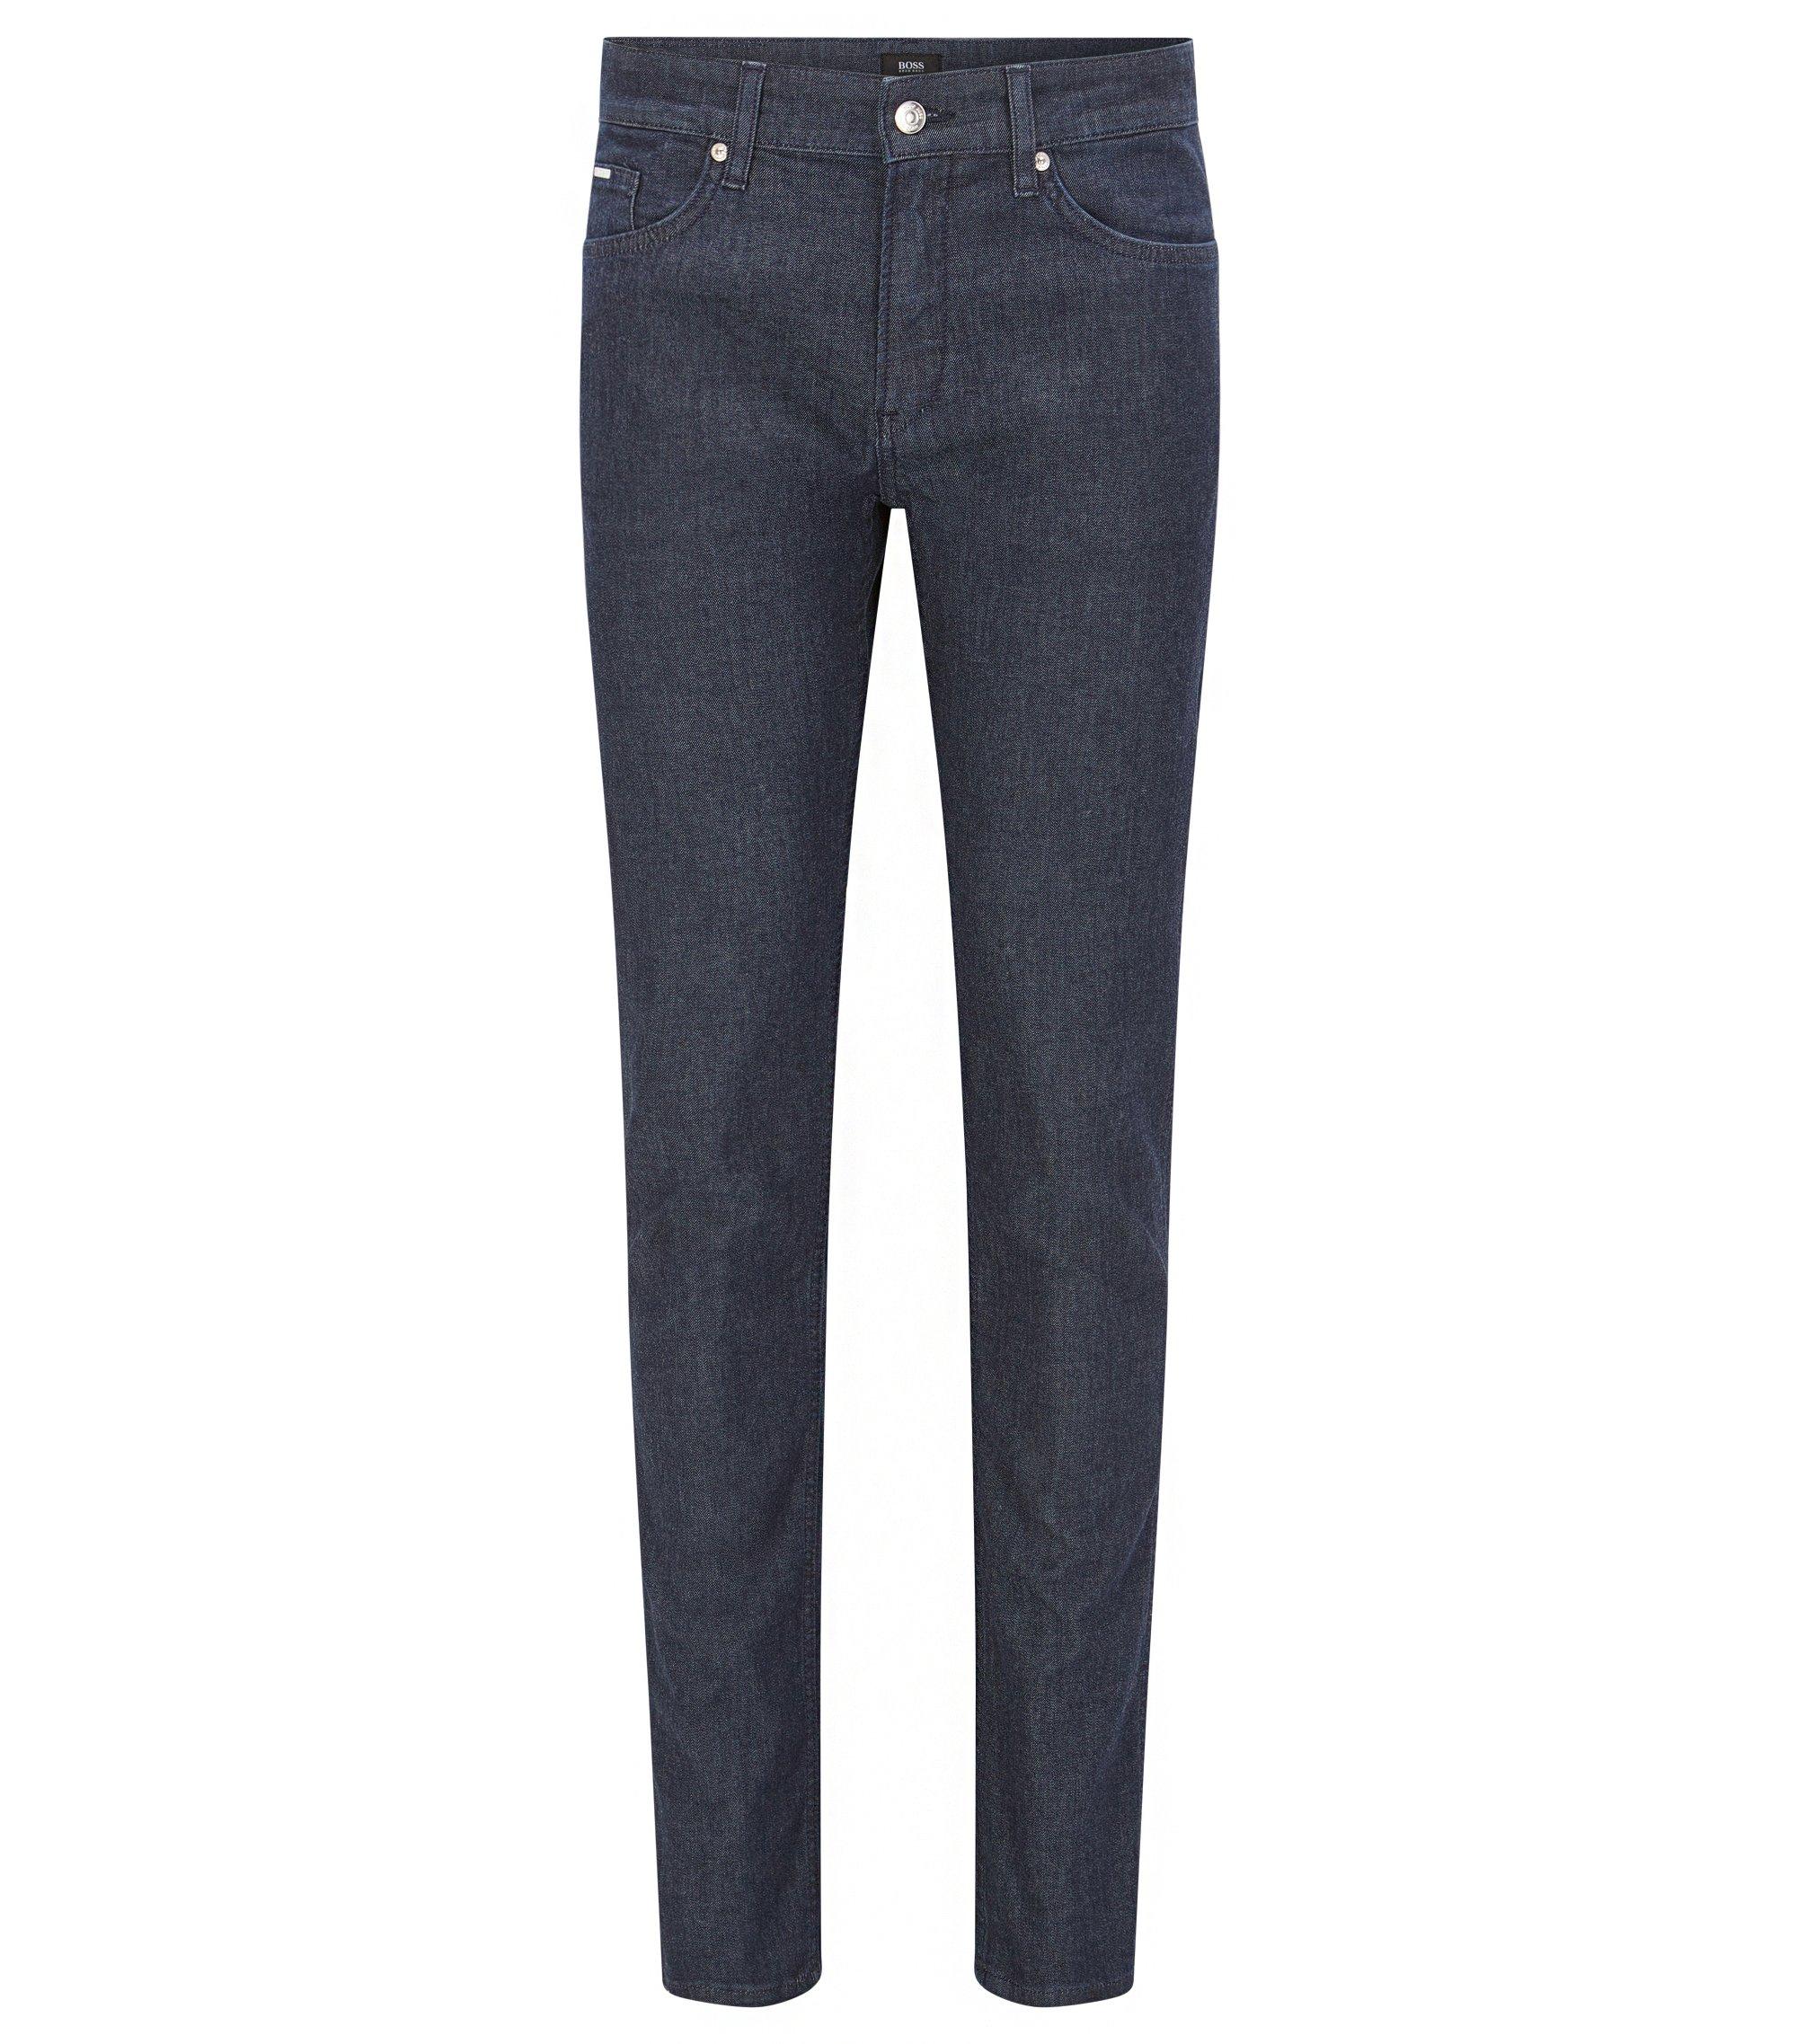 Jeans Slim Fit bleu foncé en denim stretch , Bleu foncé